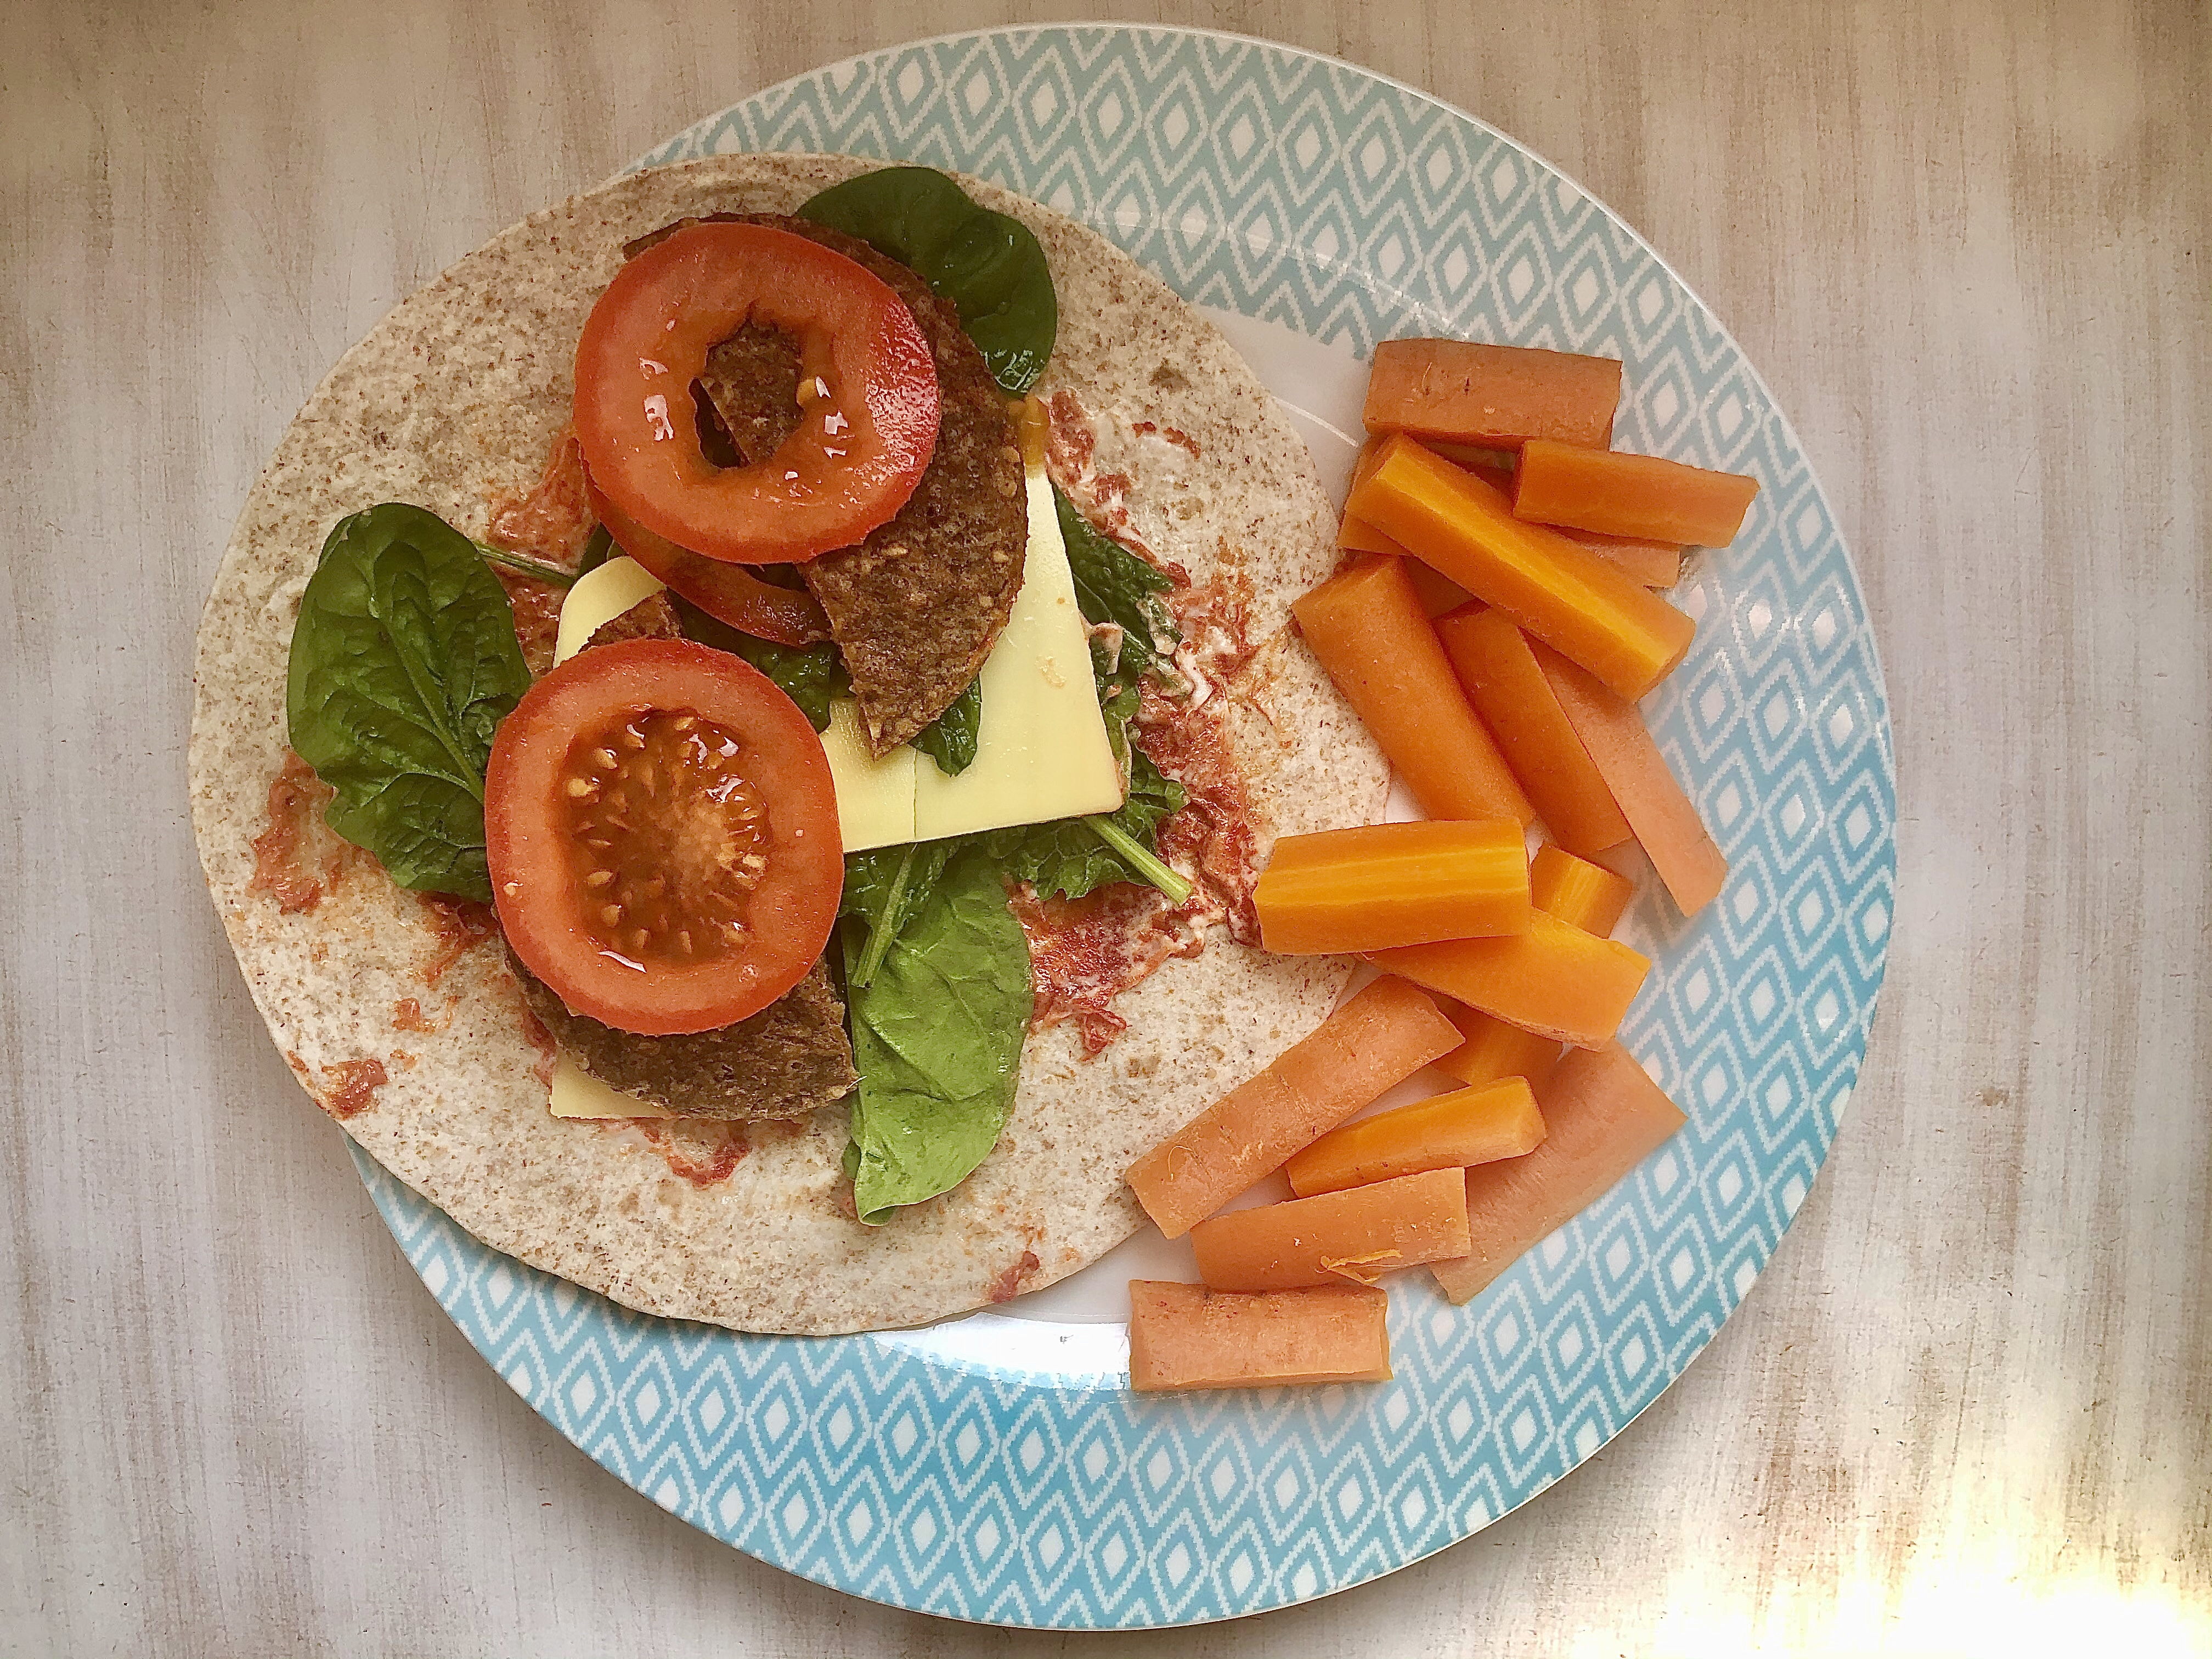 Tasty vegan burger wrap